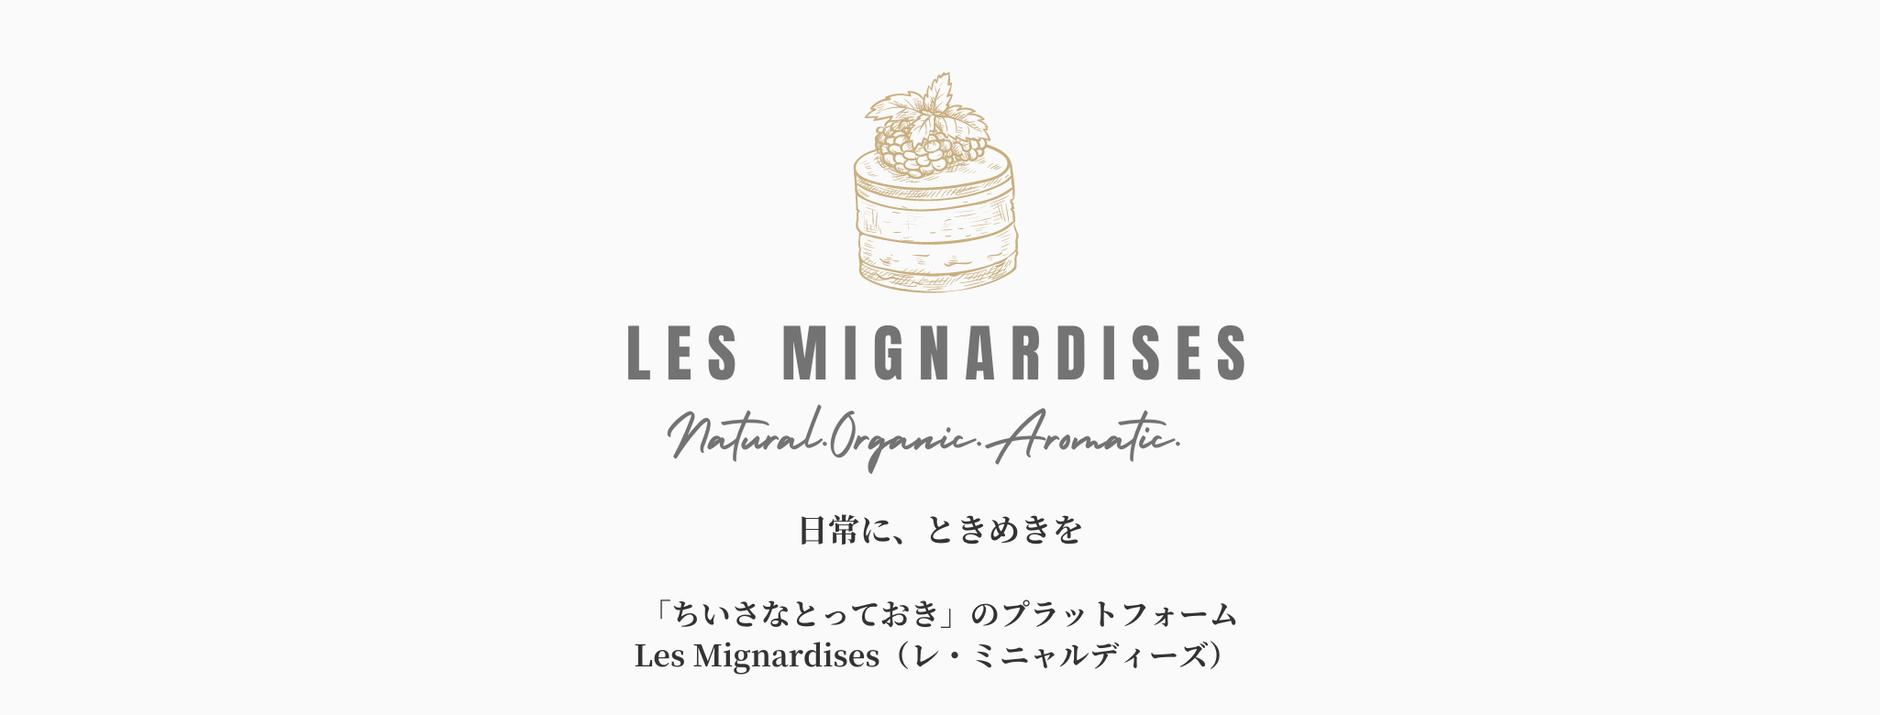 Les Mignardises